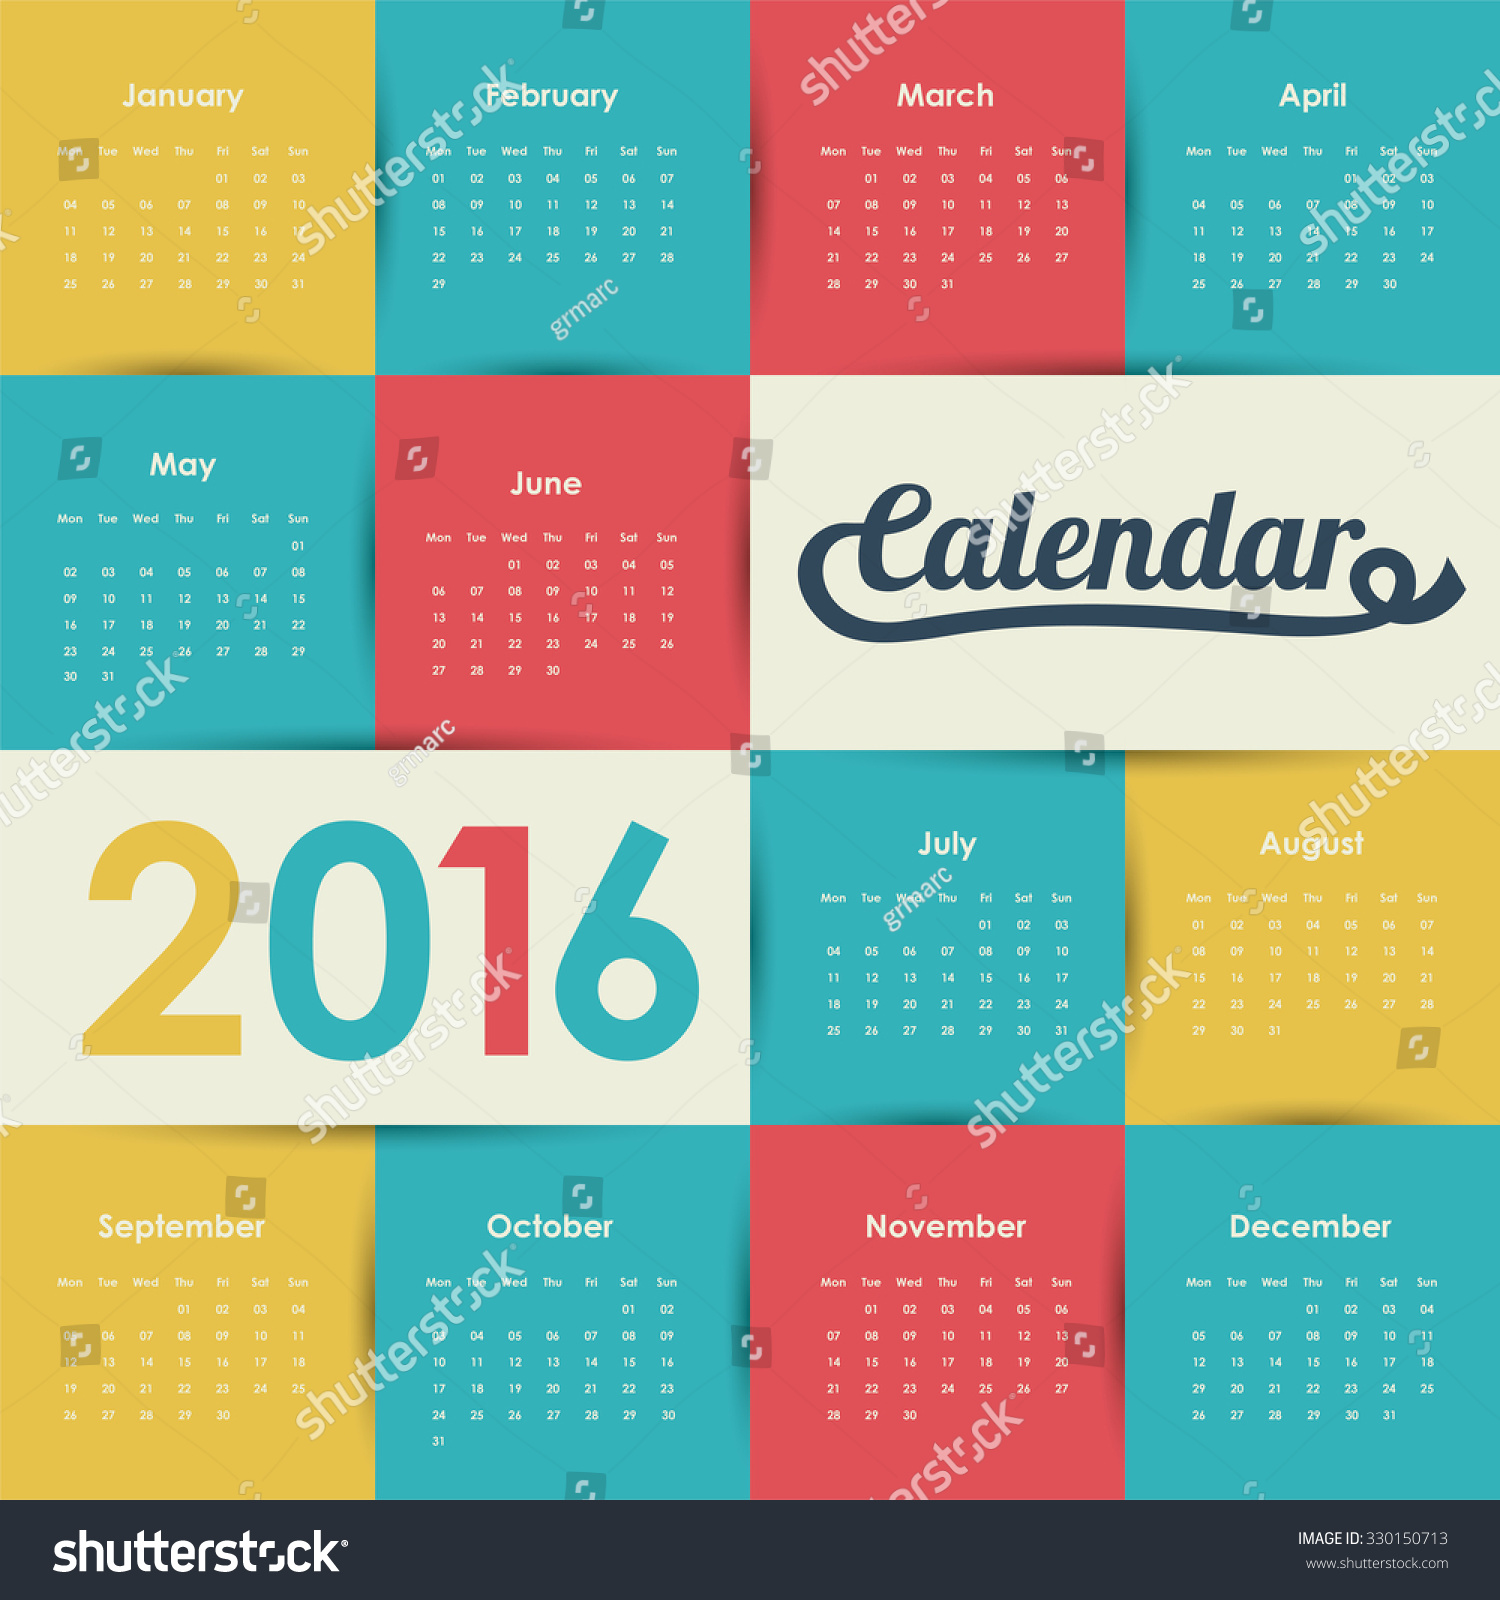 Calendar Graphic Design Images : Calendar year design vector illustration stock